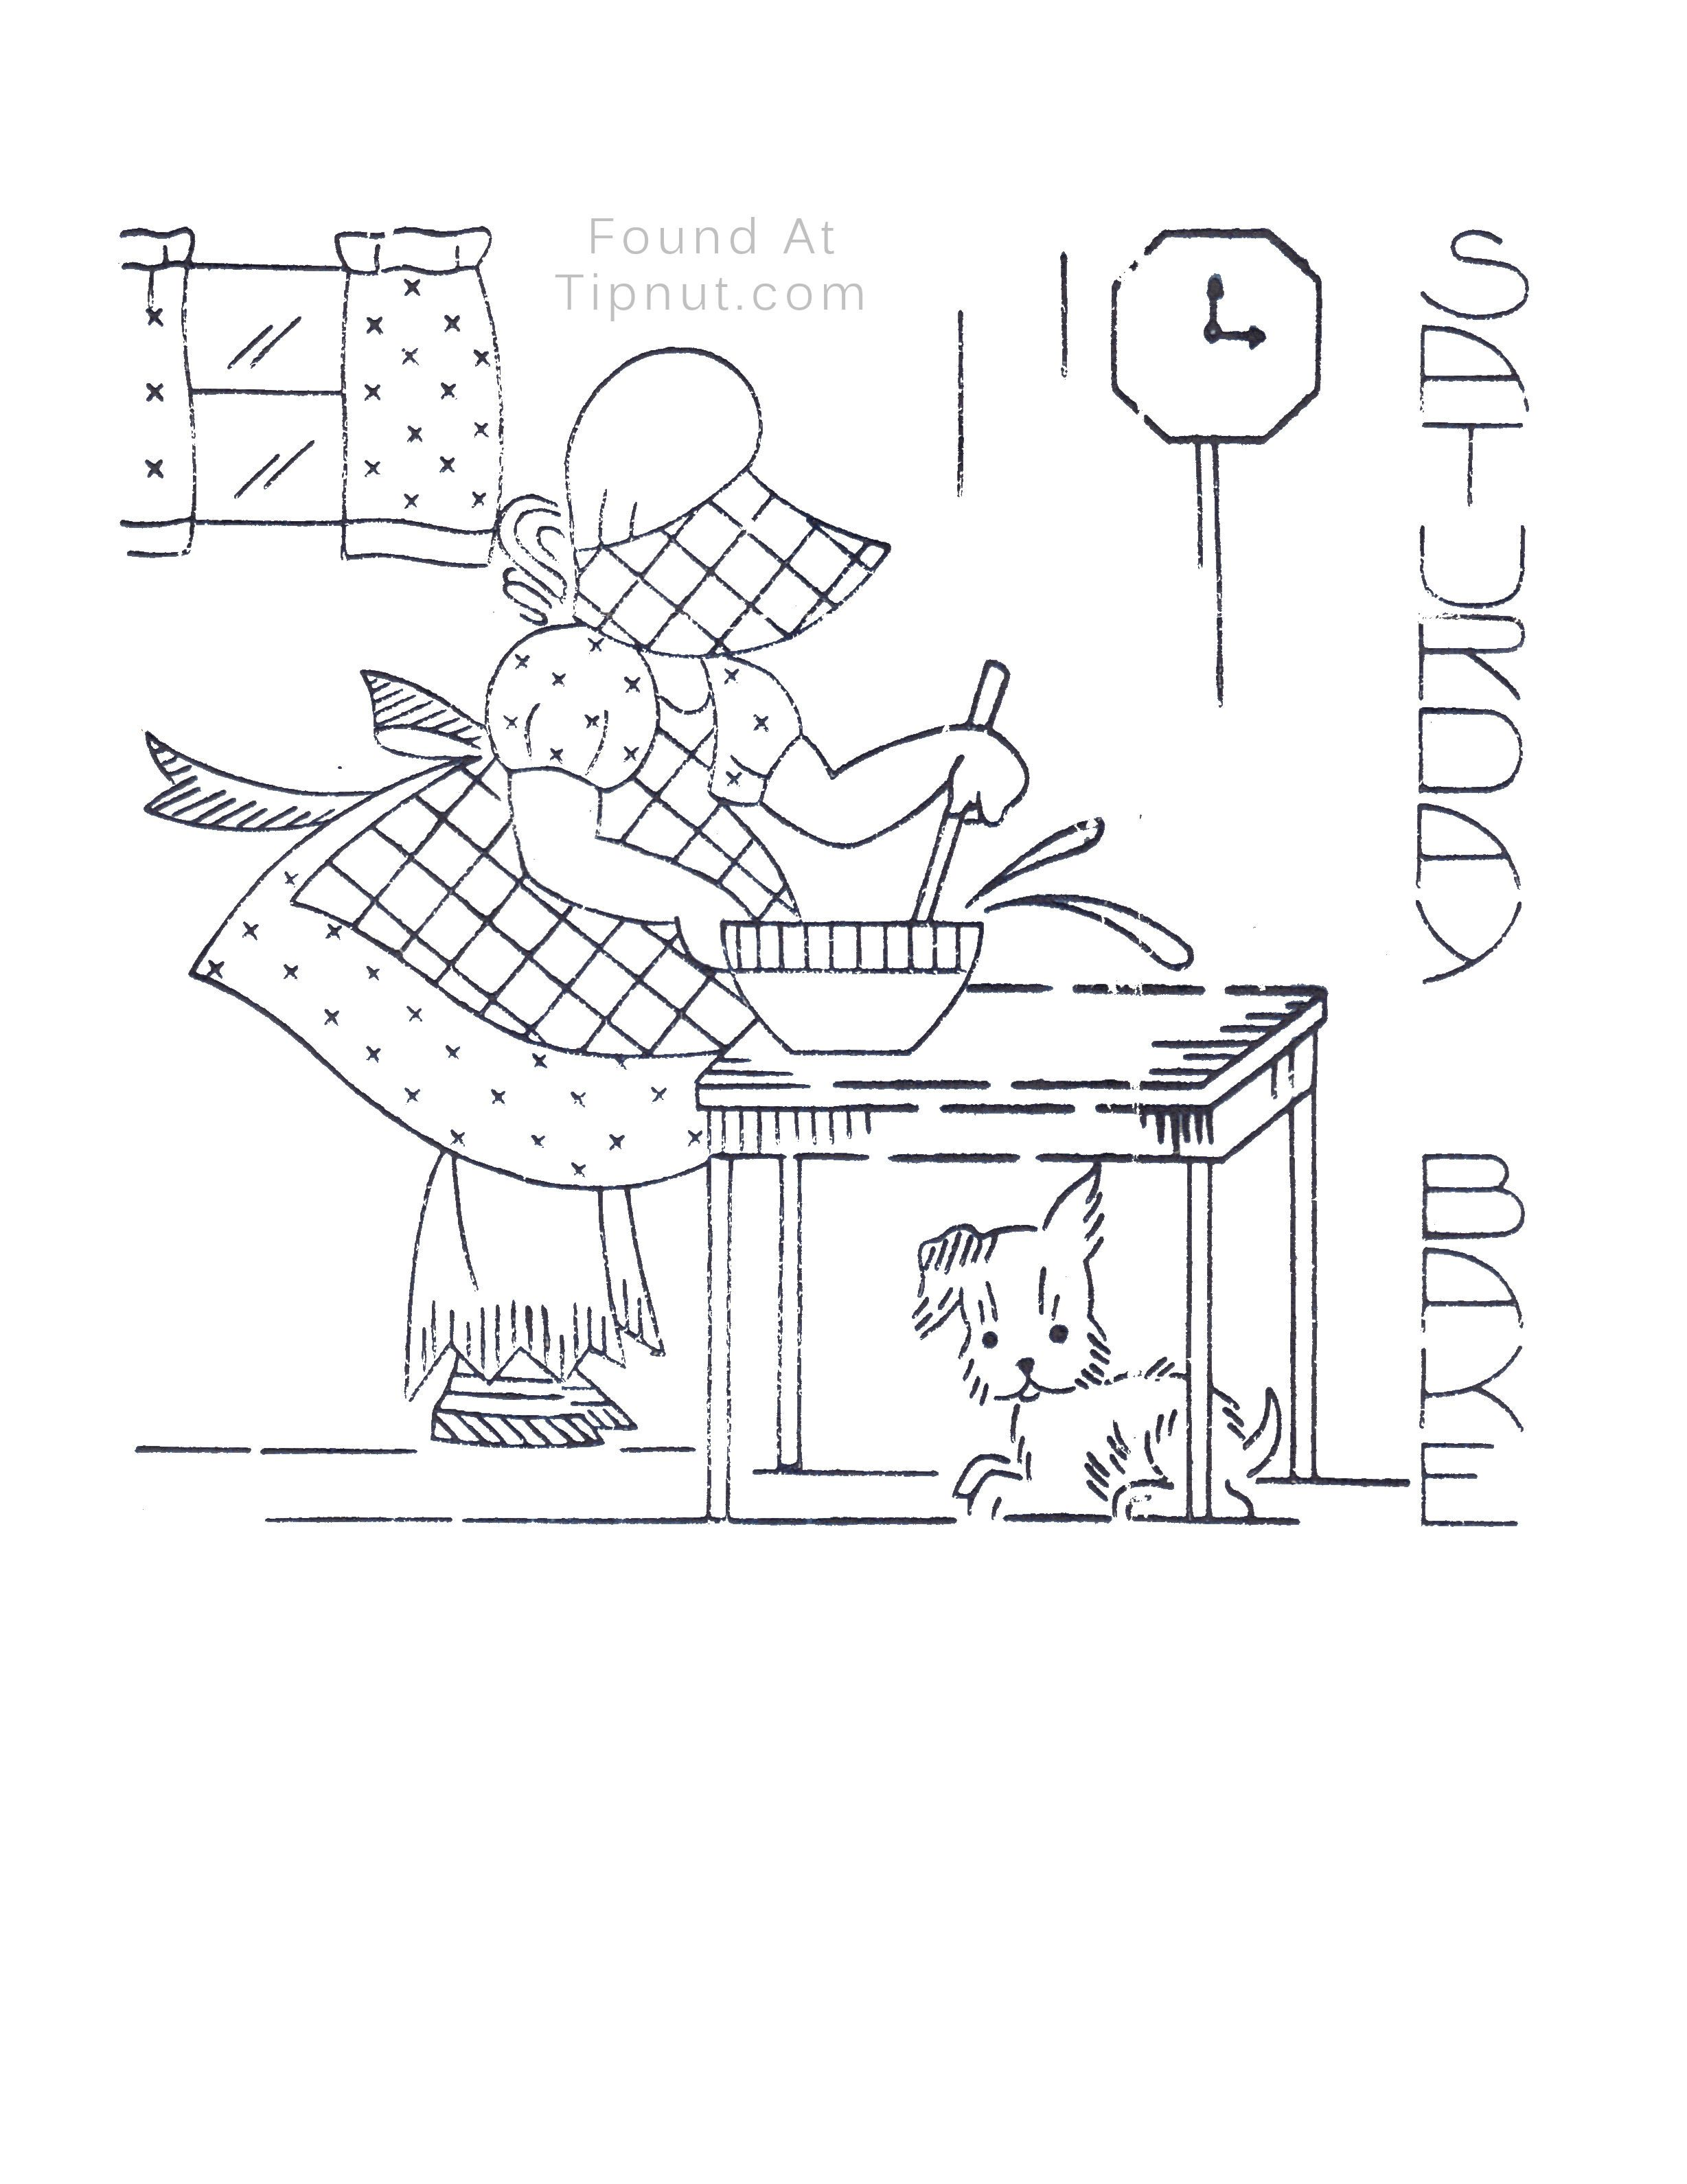 Pin de Mary Lynn Kebler en SueAndBilly | Pinterest | Bordado ...